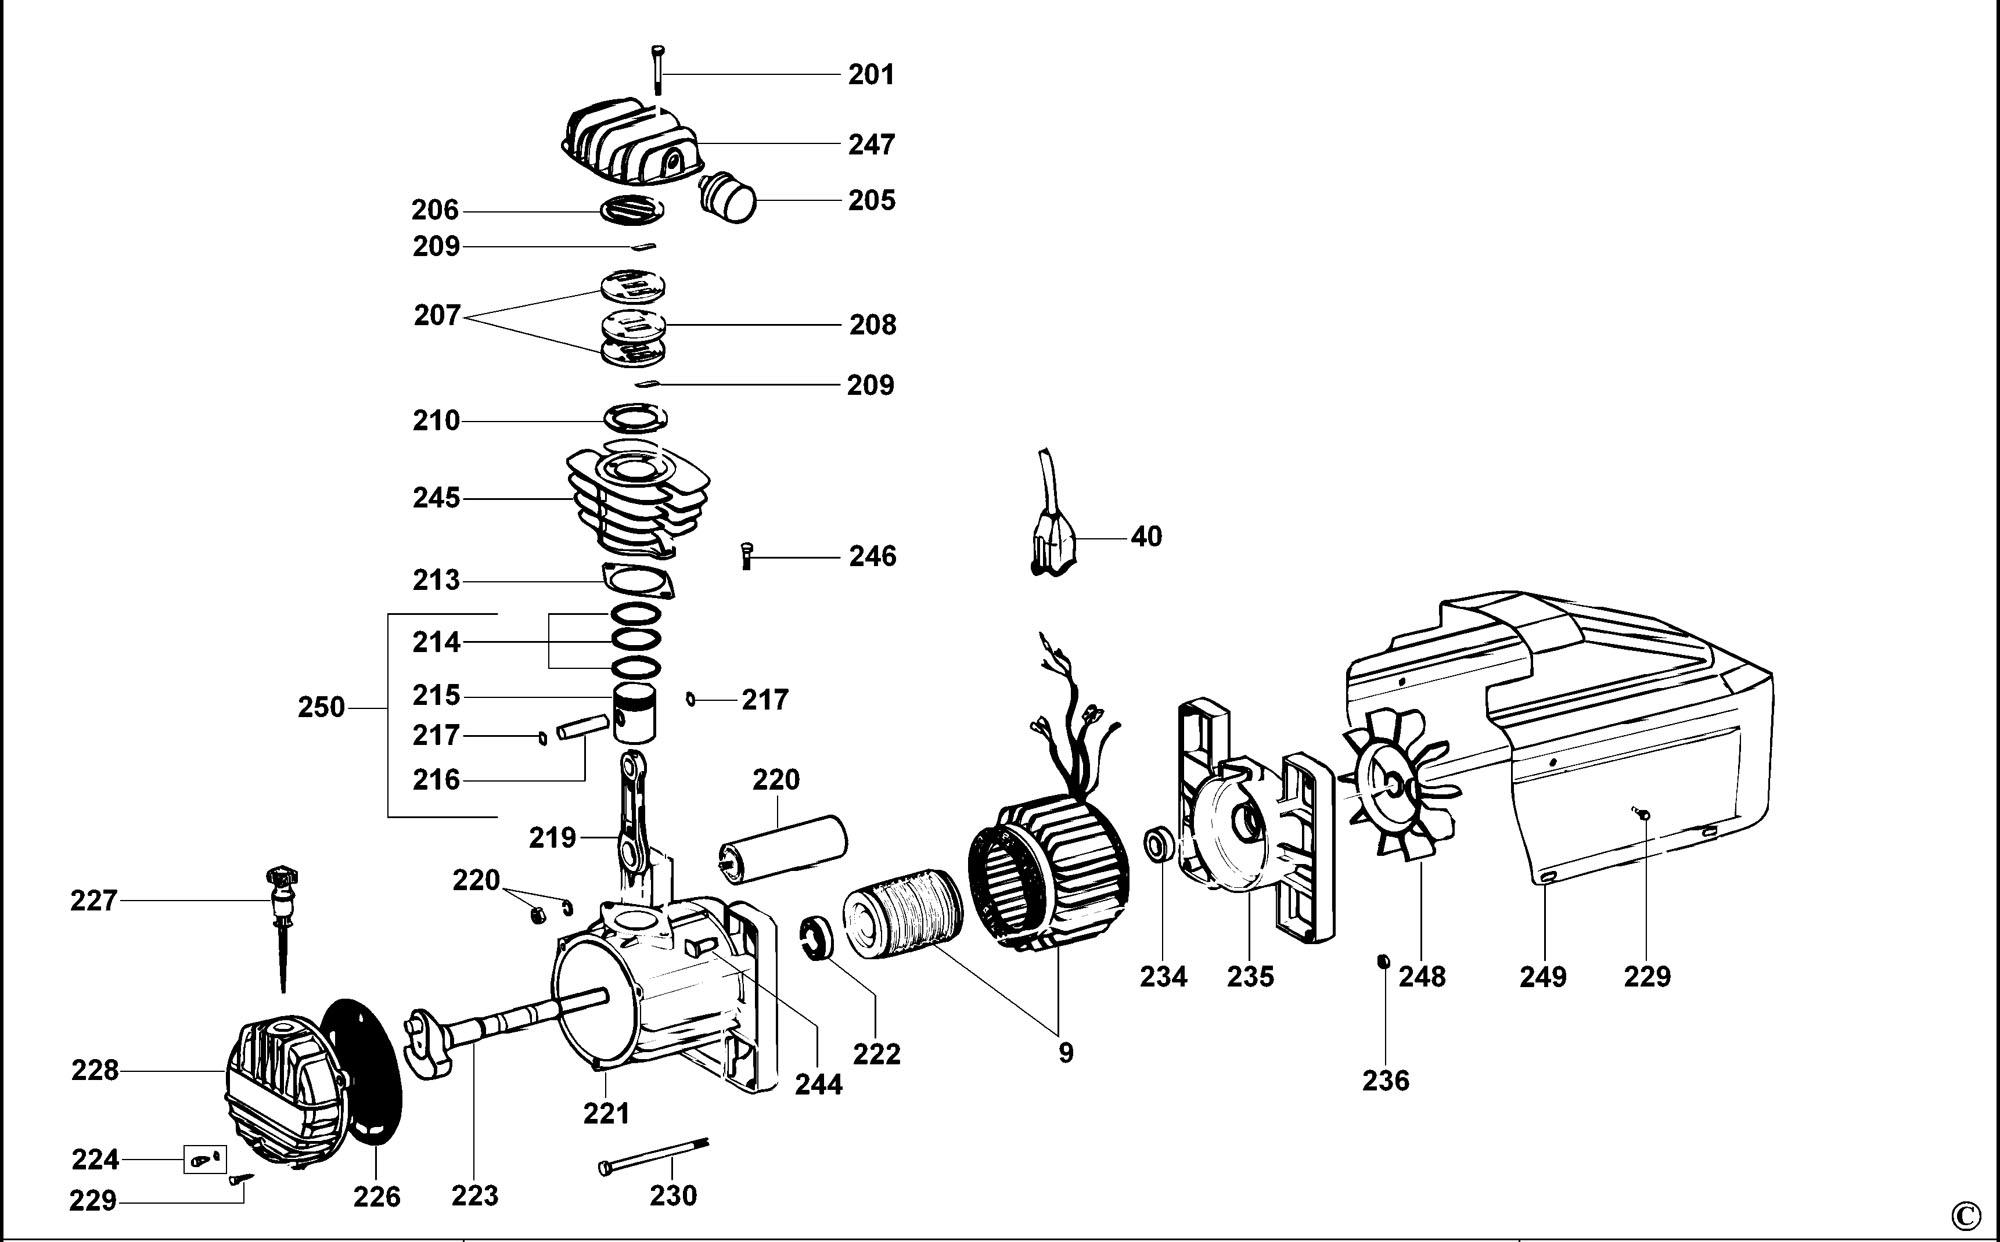 [ZHKZ_3066]  DIAGRAM] De Walt Air Compressor Wiring Diagram FULL Version HD Quality Wiring  Diagram - WIRINGCONNECTORS.LEXANESIRAC.FR   Dewalt Air Compressor Wiring Diagram      wiringconnectors.lexanesirac.fr